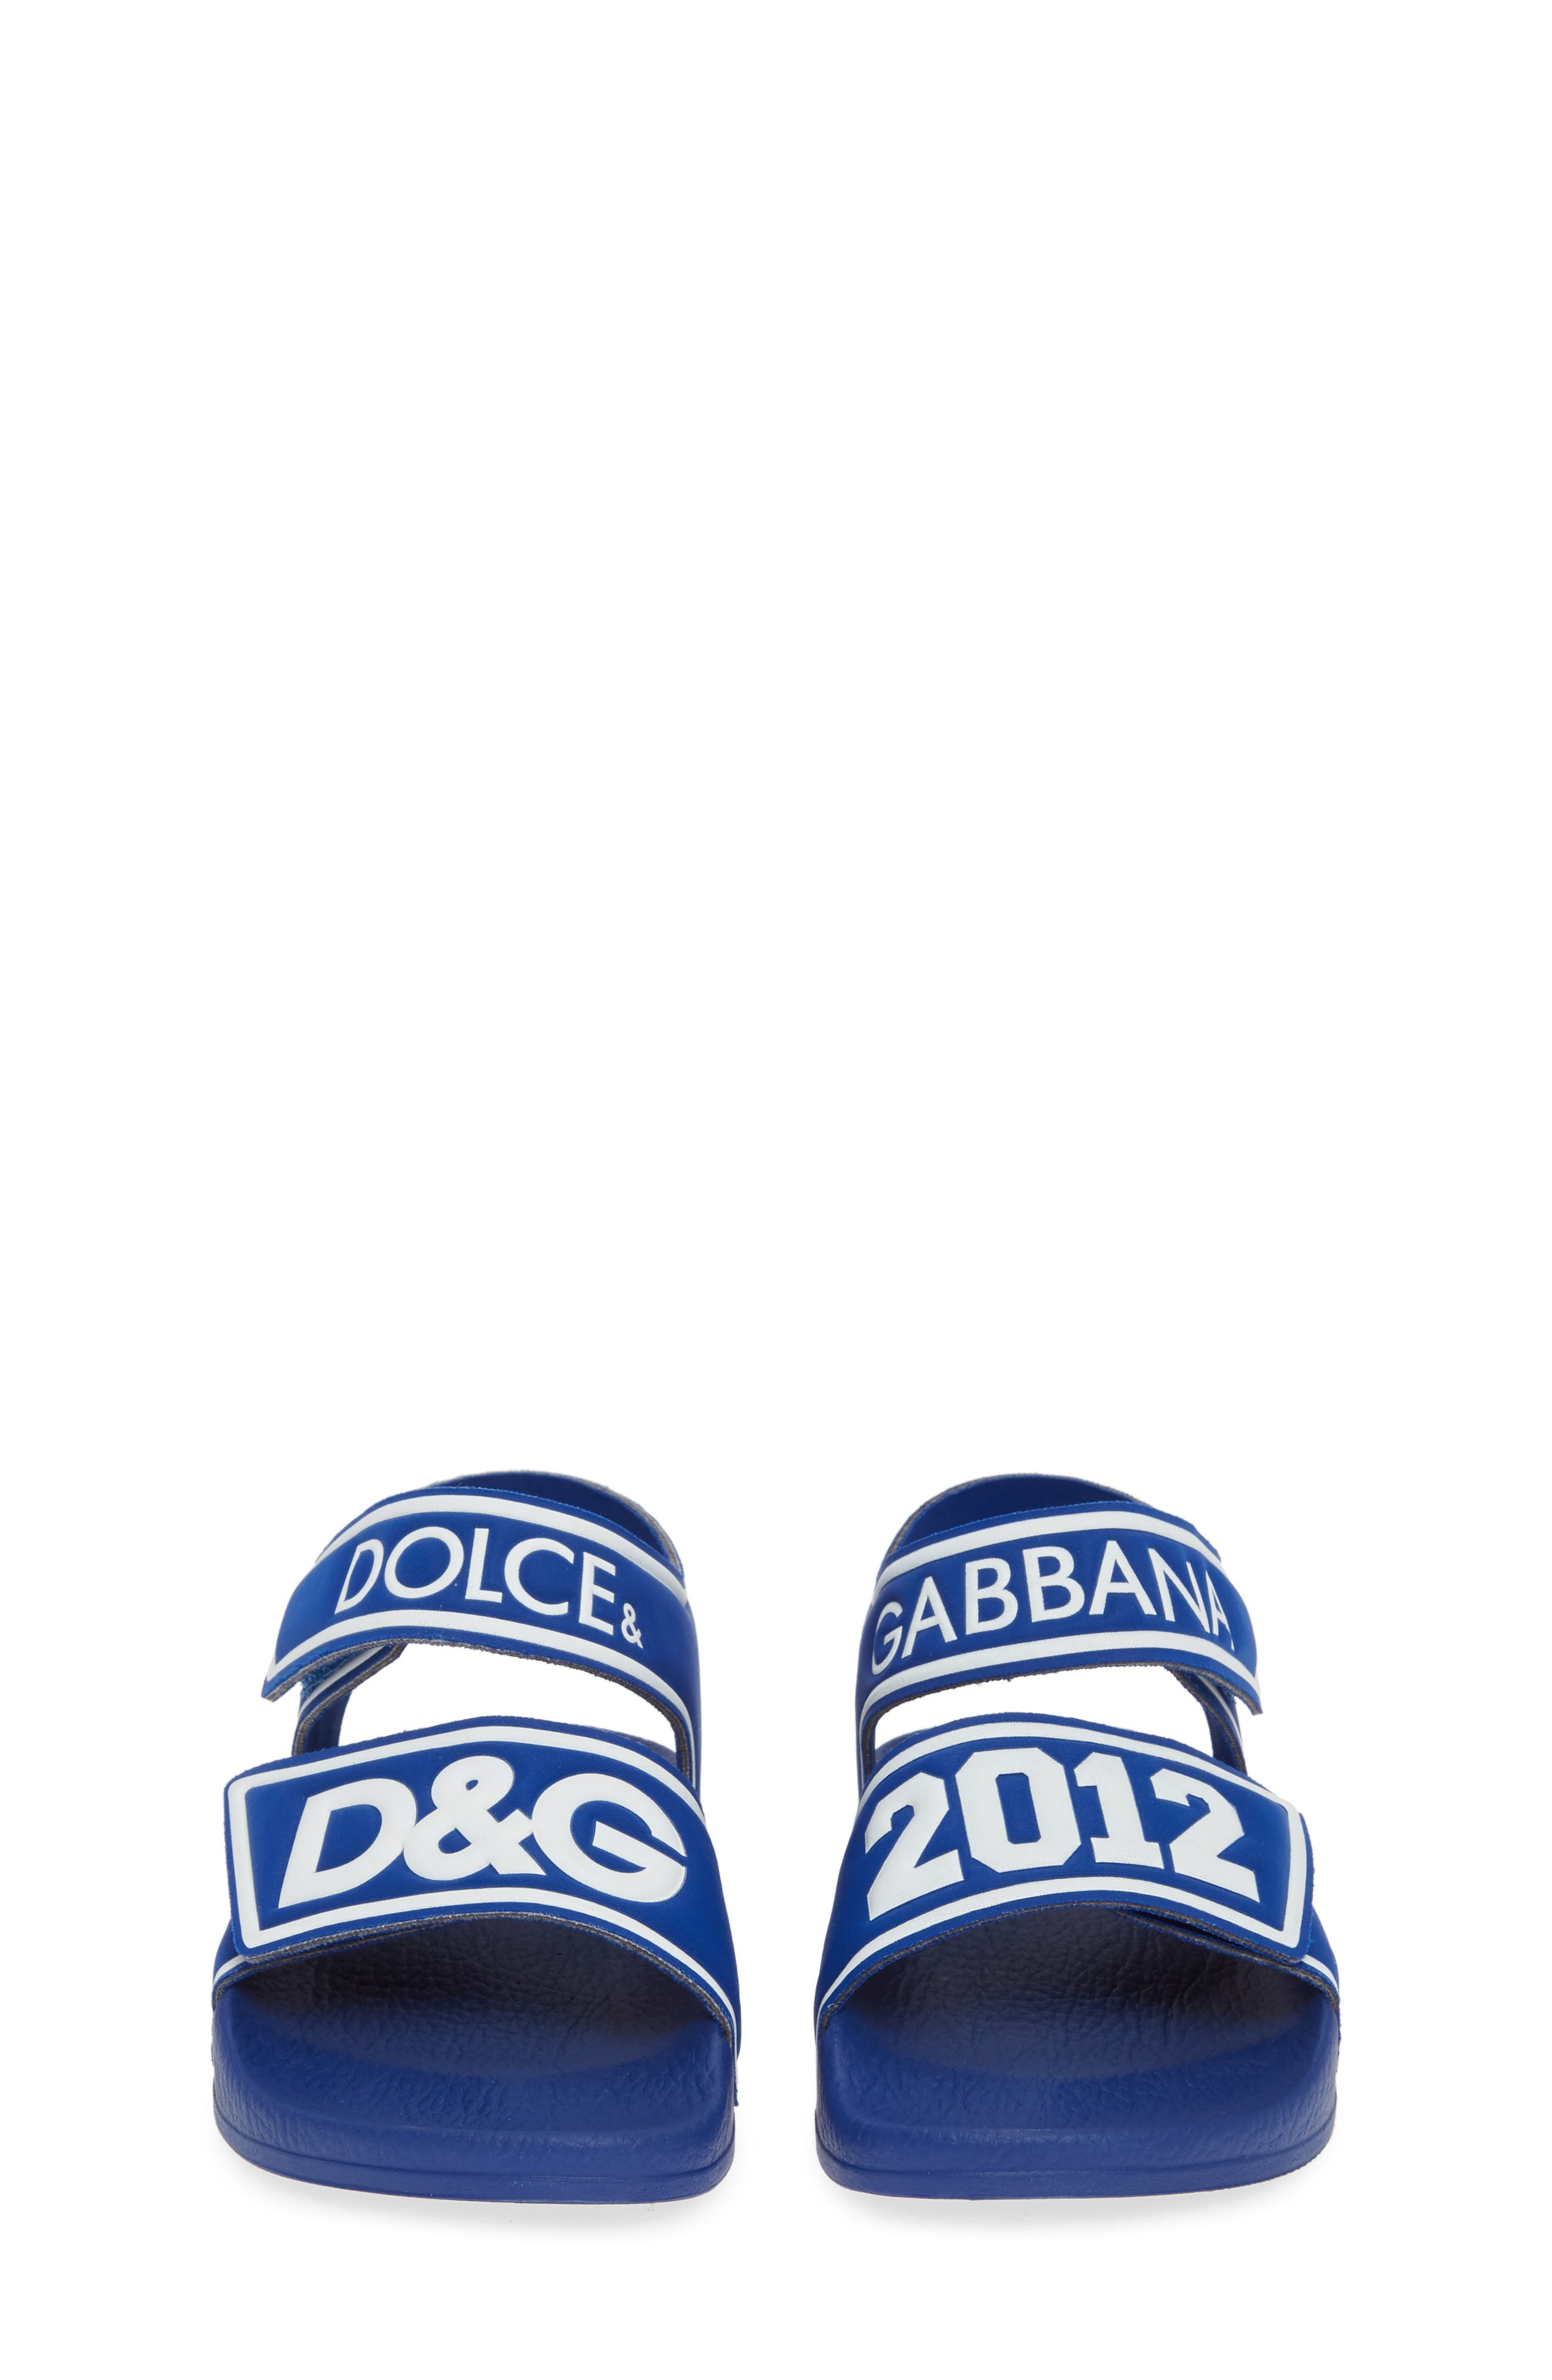 DOLCE&GABBANA, Jelly Fisherman Sandal, Alternate thumbnail 5, color, BLUE/ WHITE